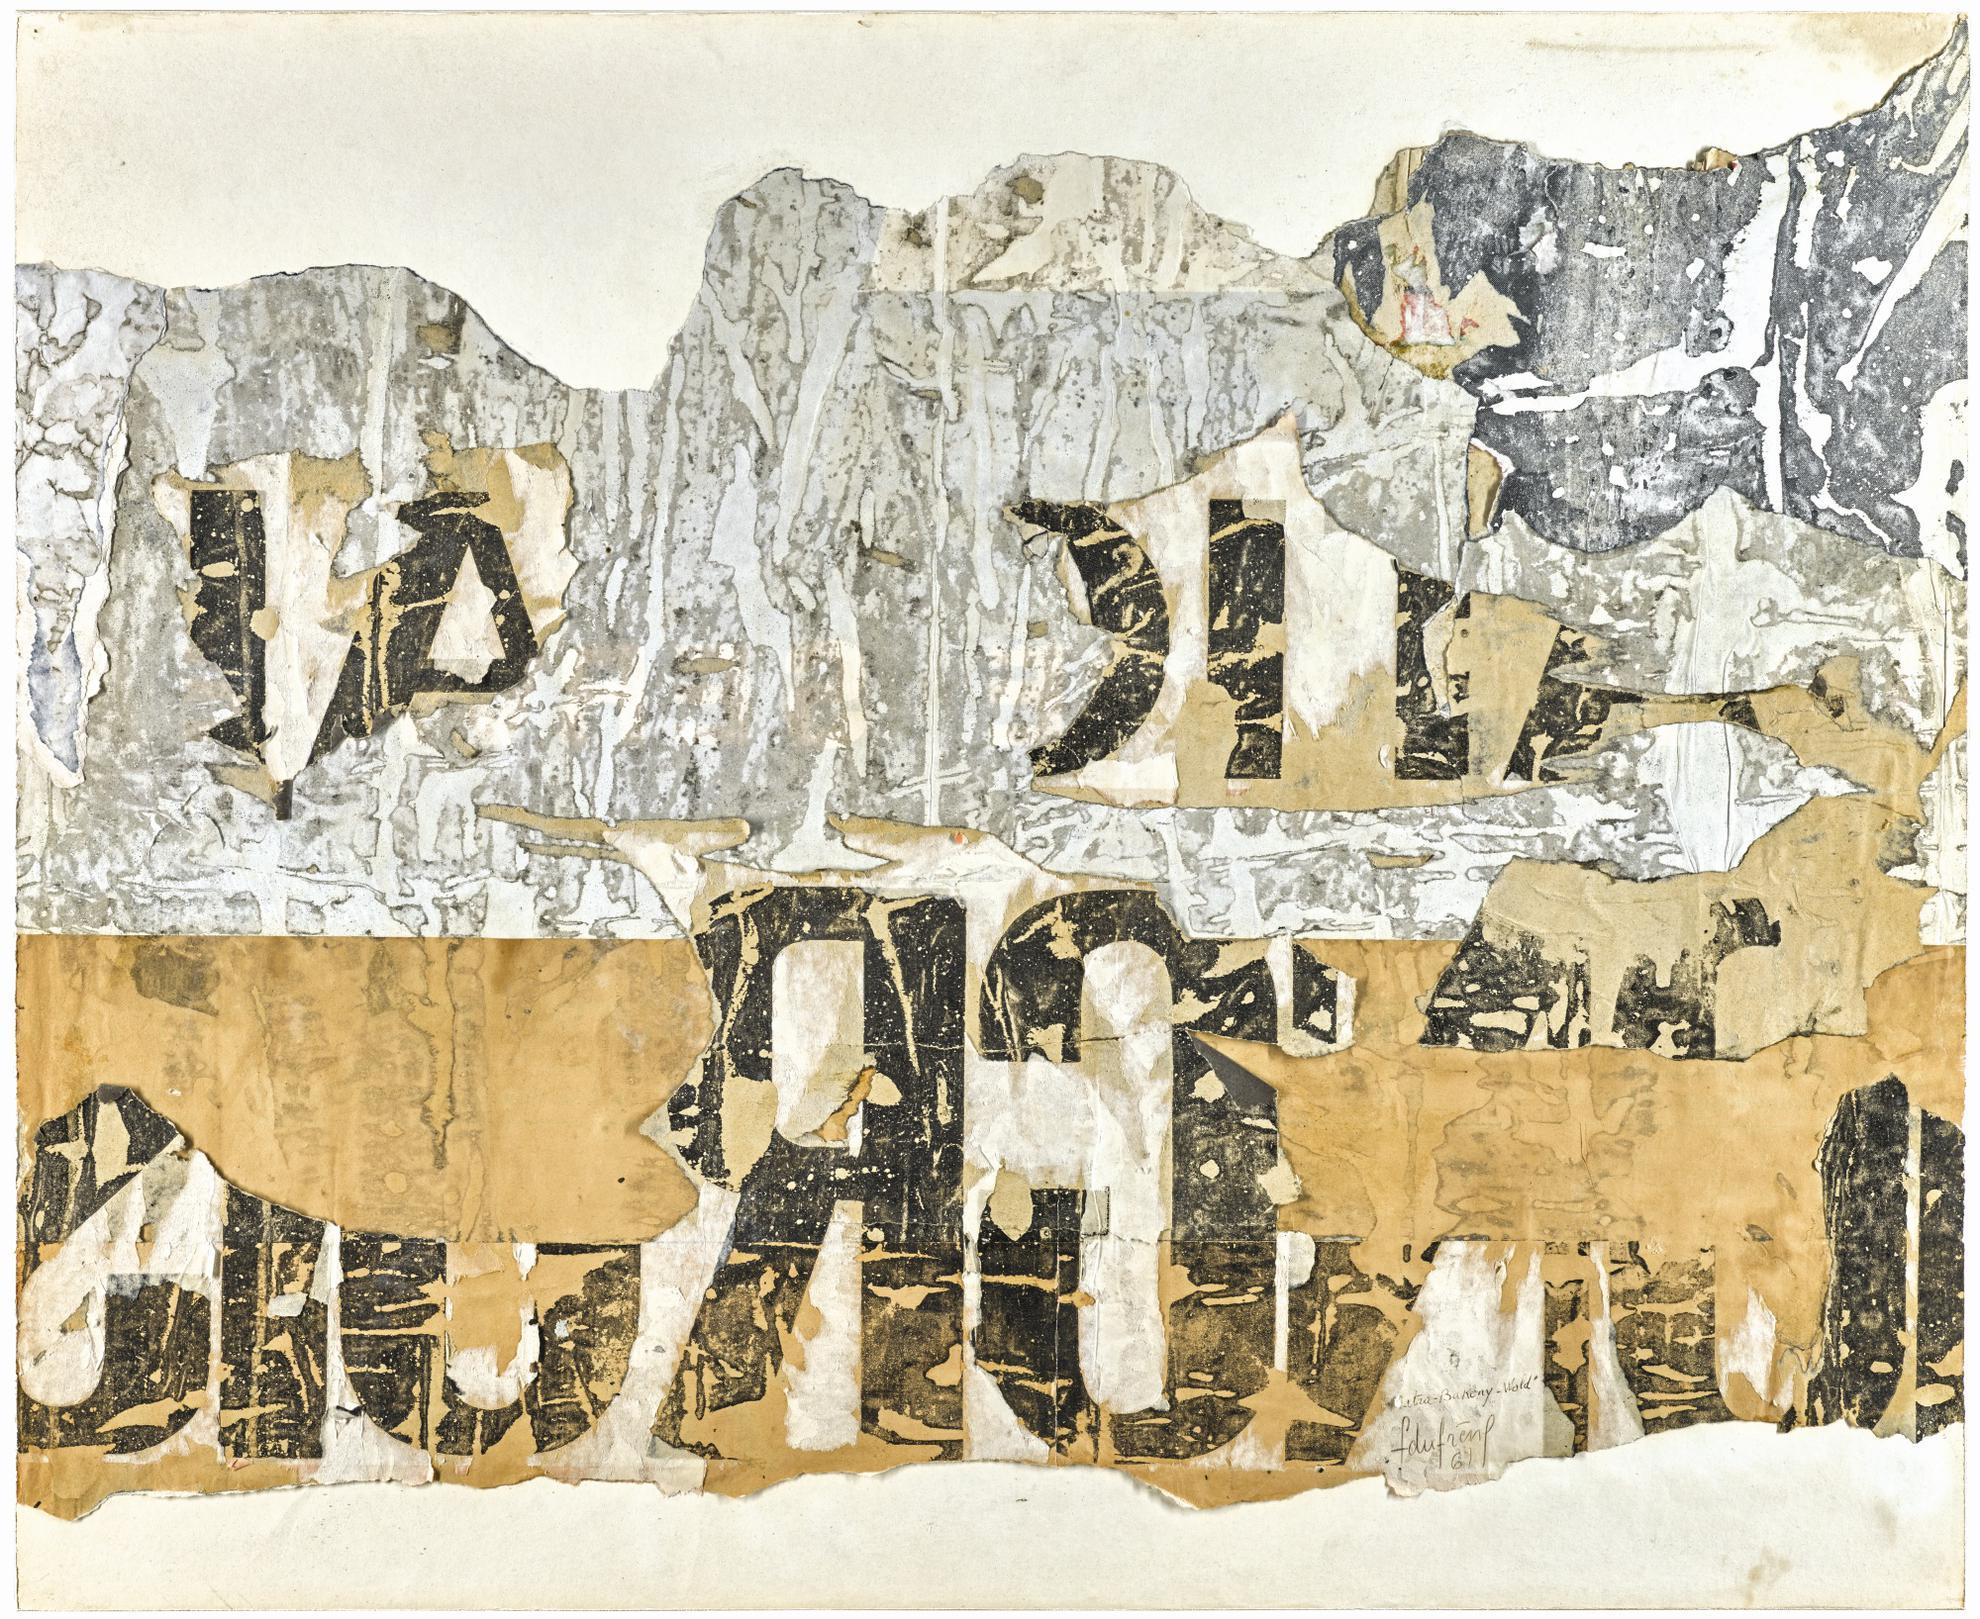 Francois Dufrene-Matra Bakony Wald-1961